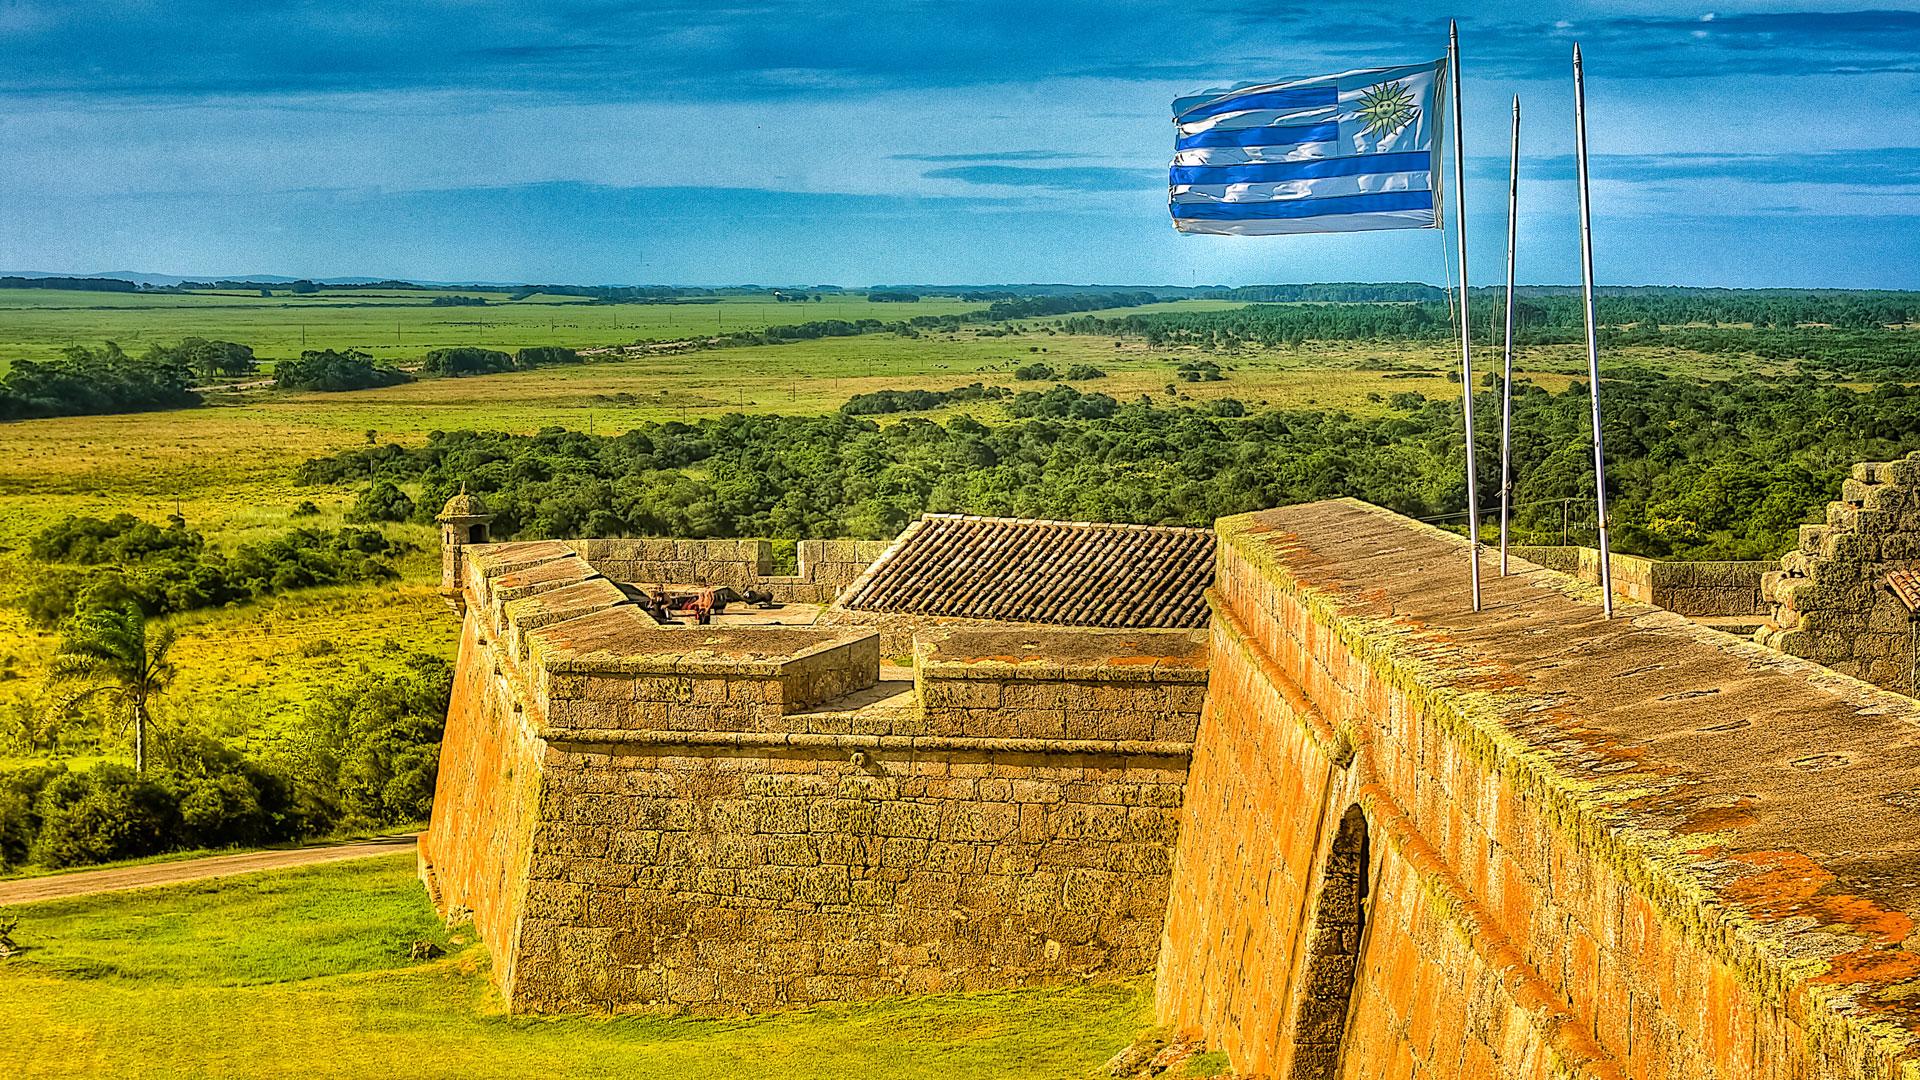 Parque Nacional de Santa Teresa no Uruguai: fortaleza